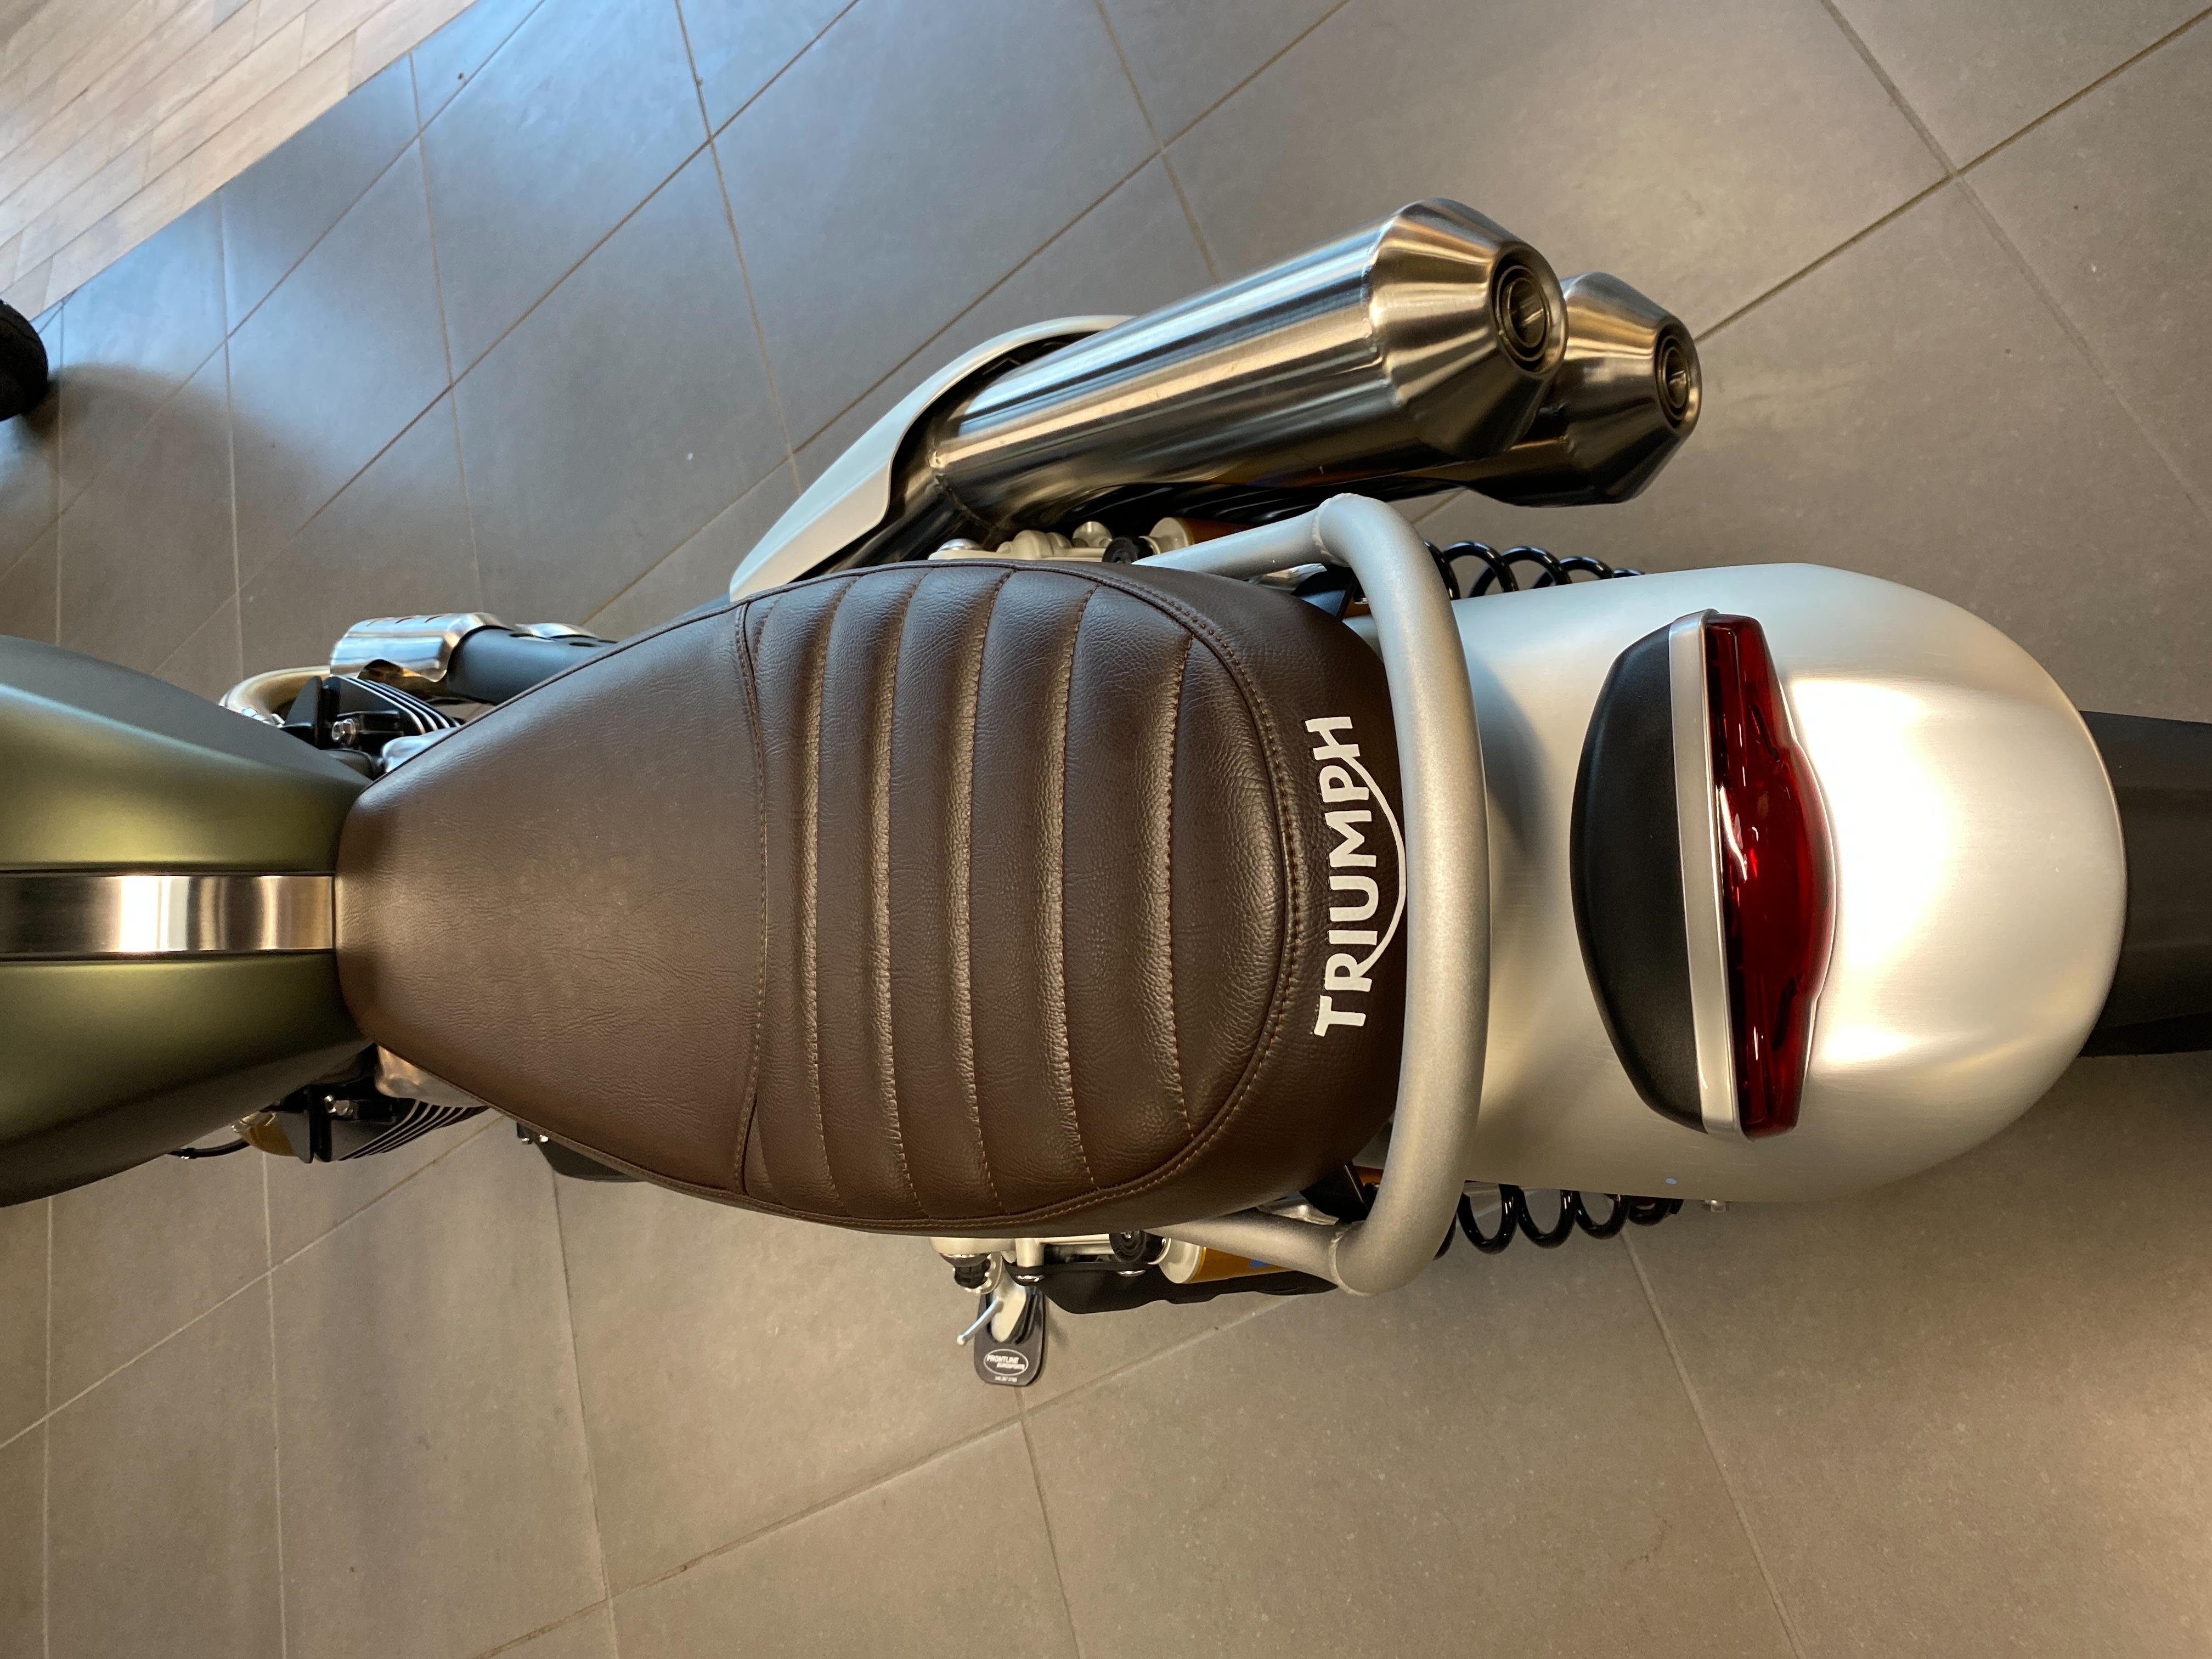 2022 Triumph Scrambler 1200 XC at Frontline Eurosports